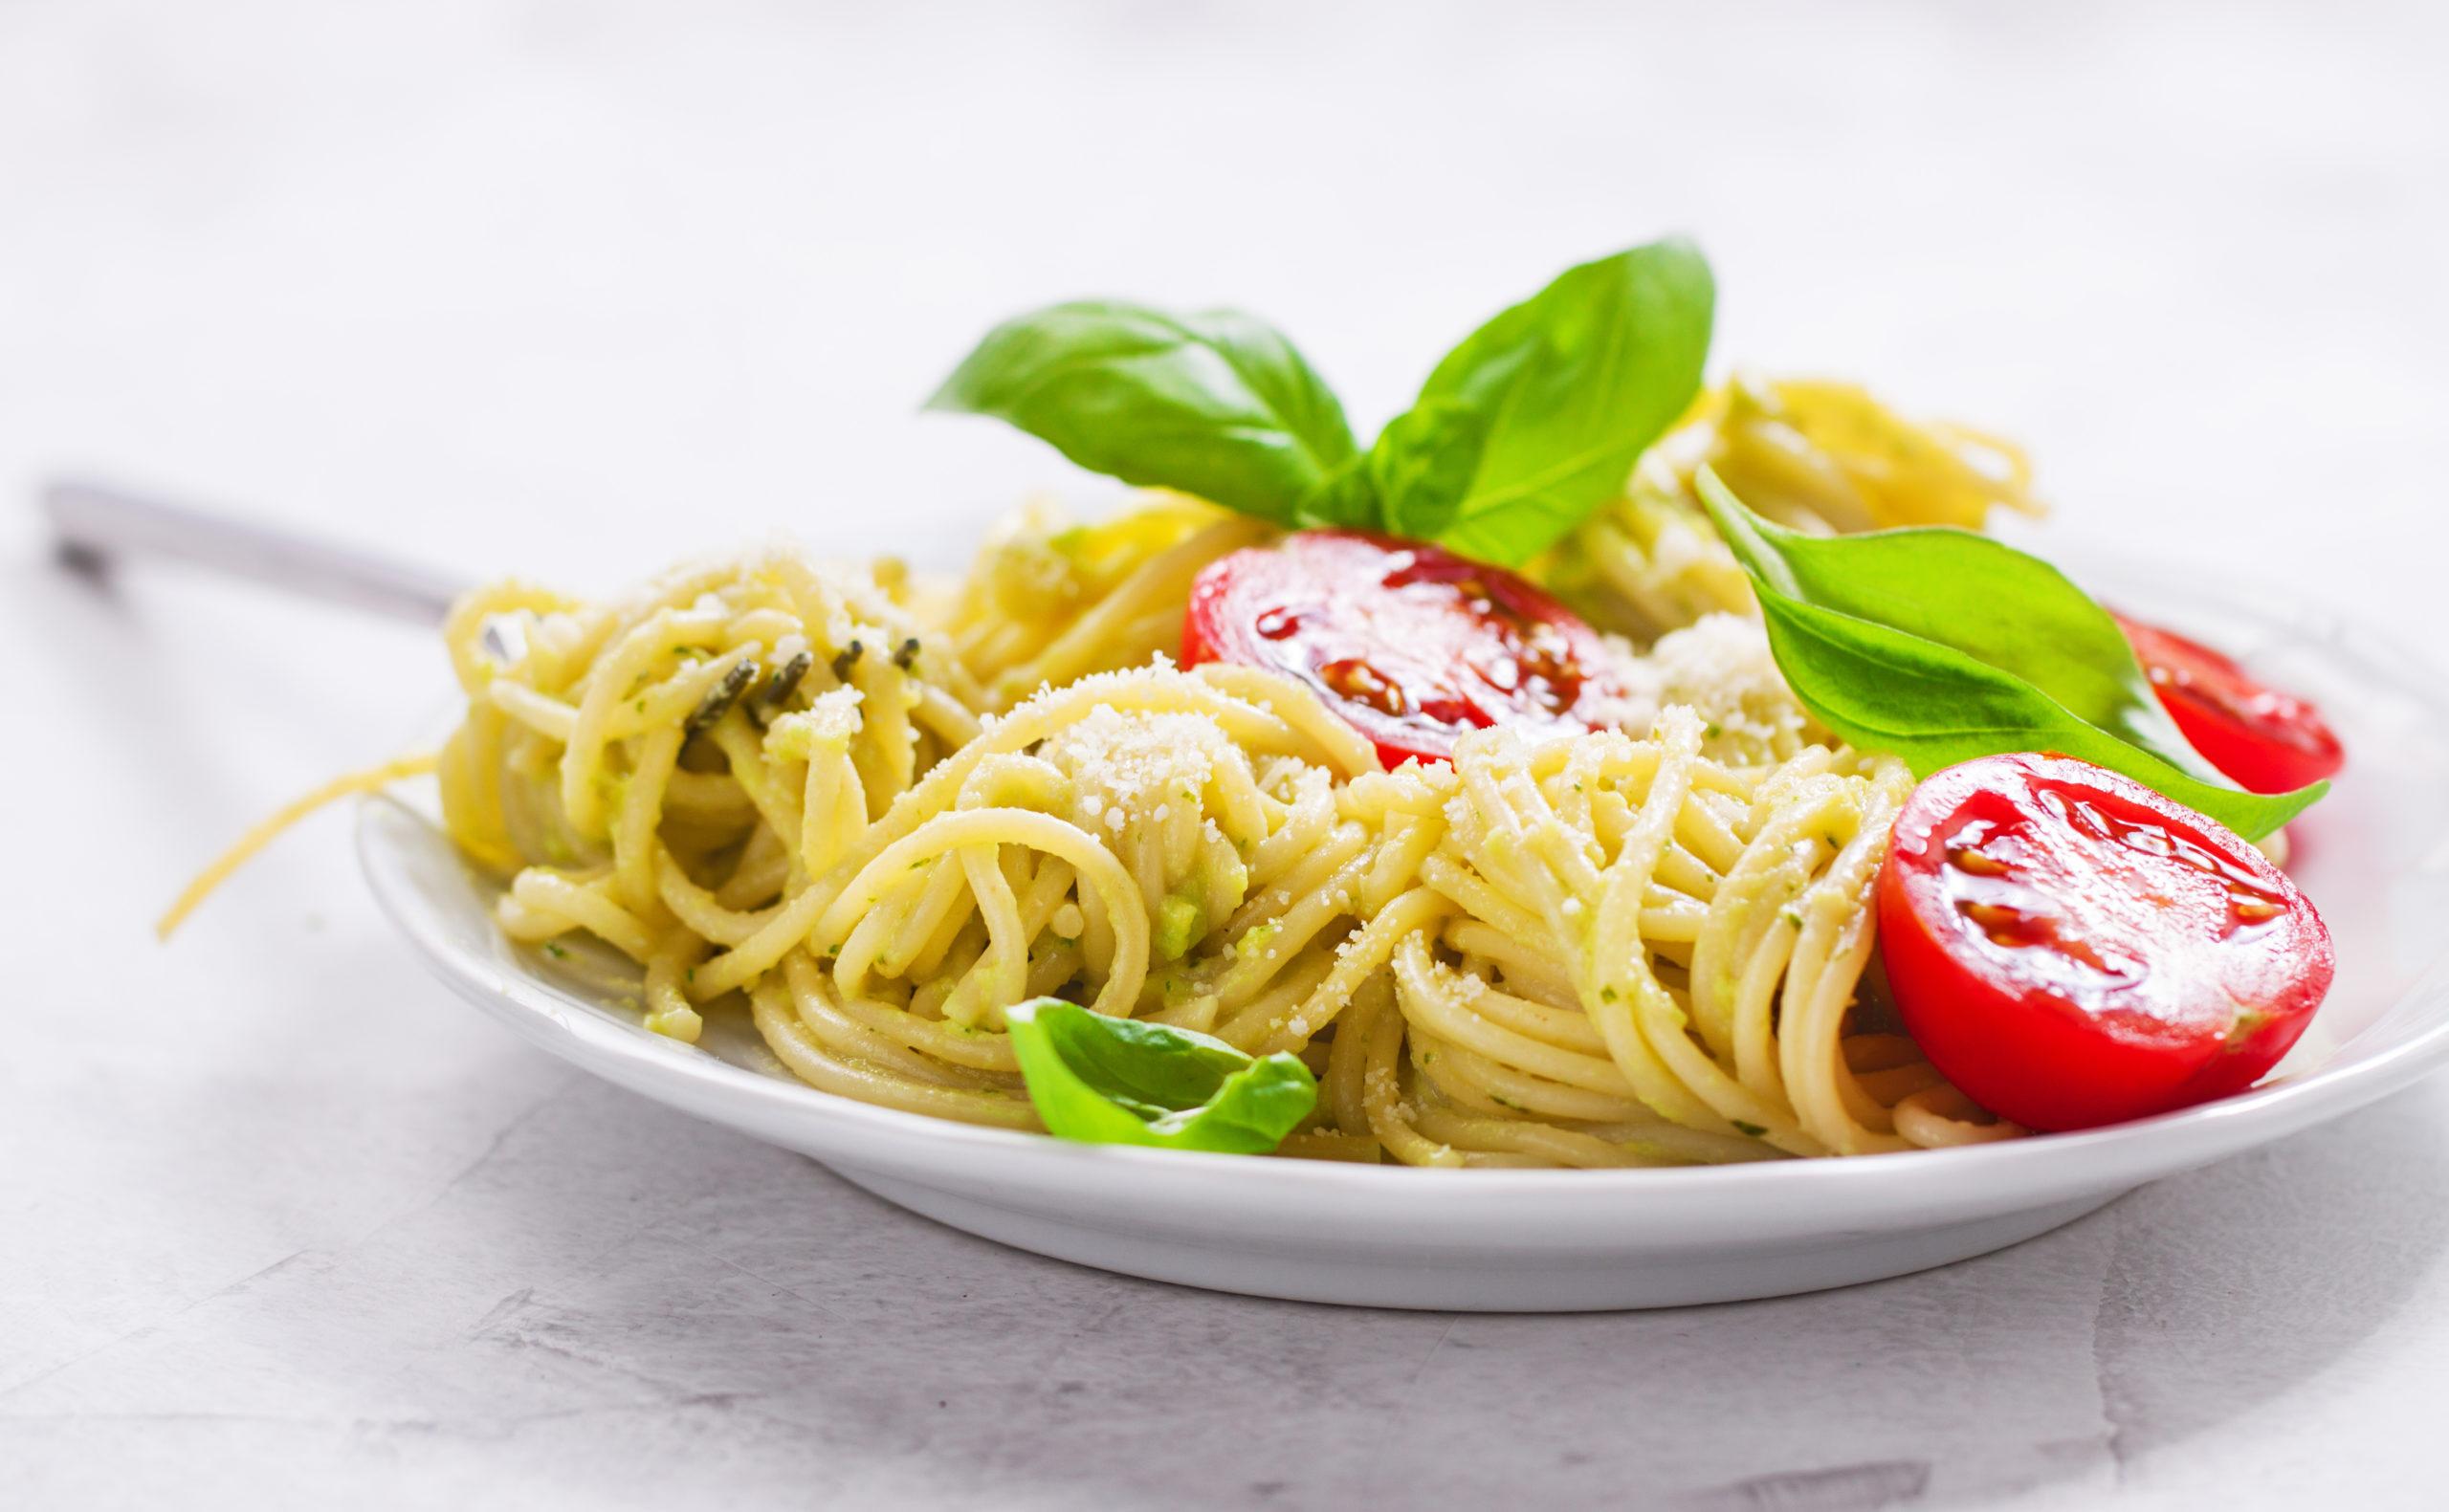 Homemade spaghetti pasta with avocado, tomato and basil sauce, closeup